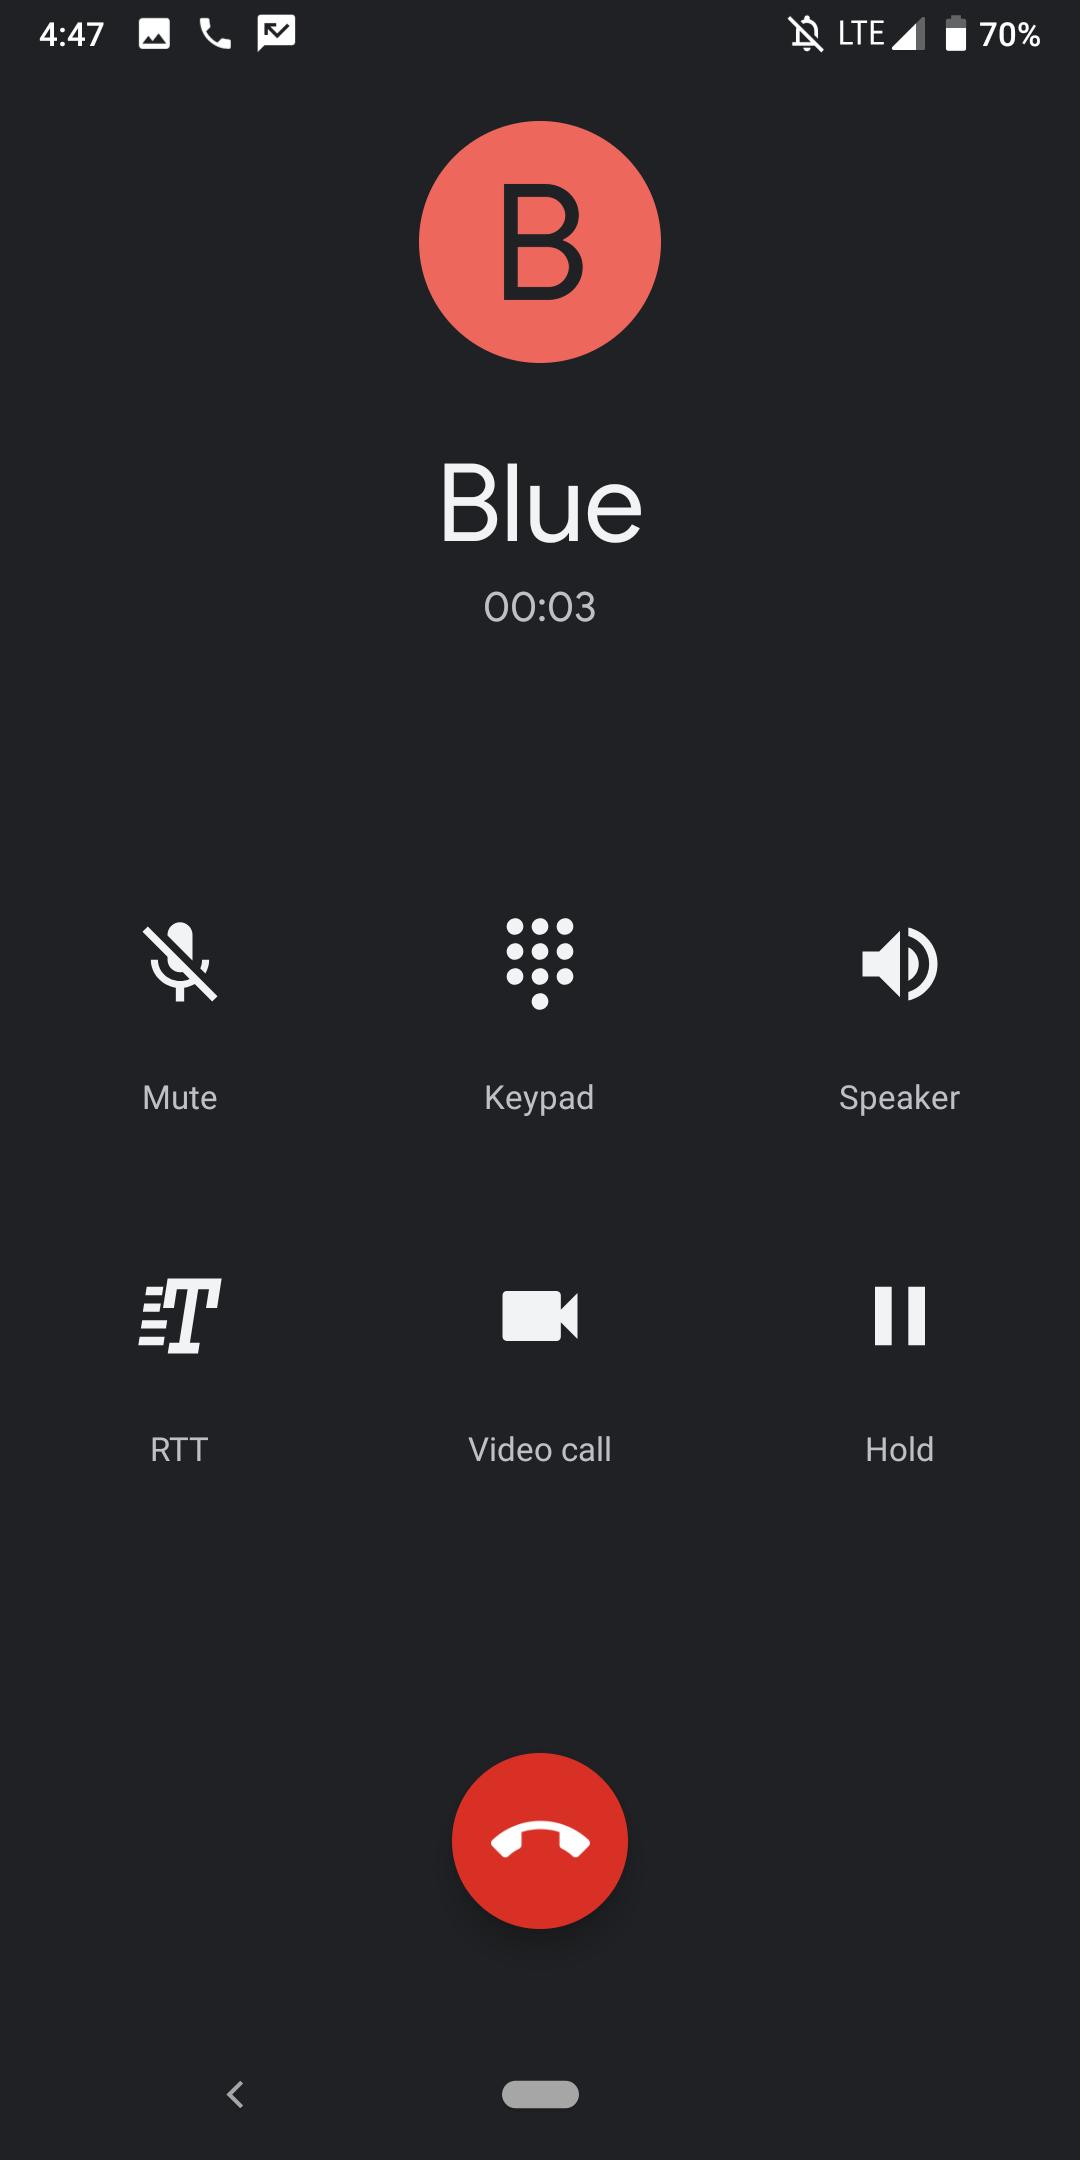 google-phone-29-rtt-2